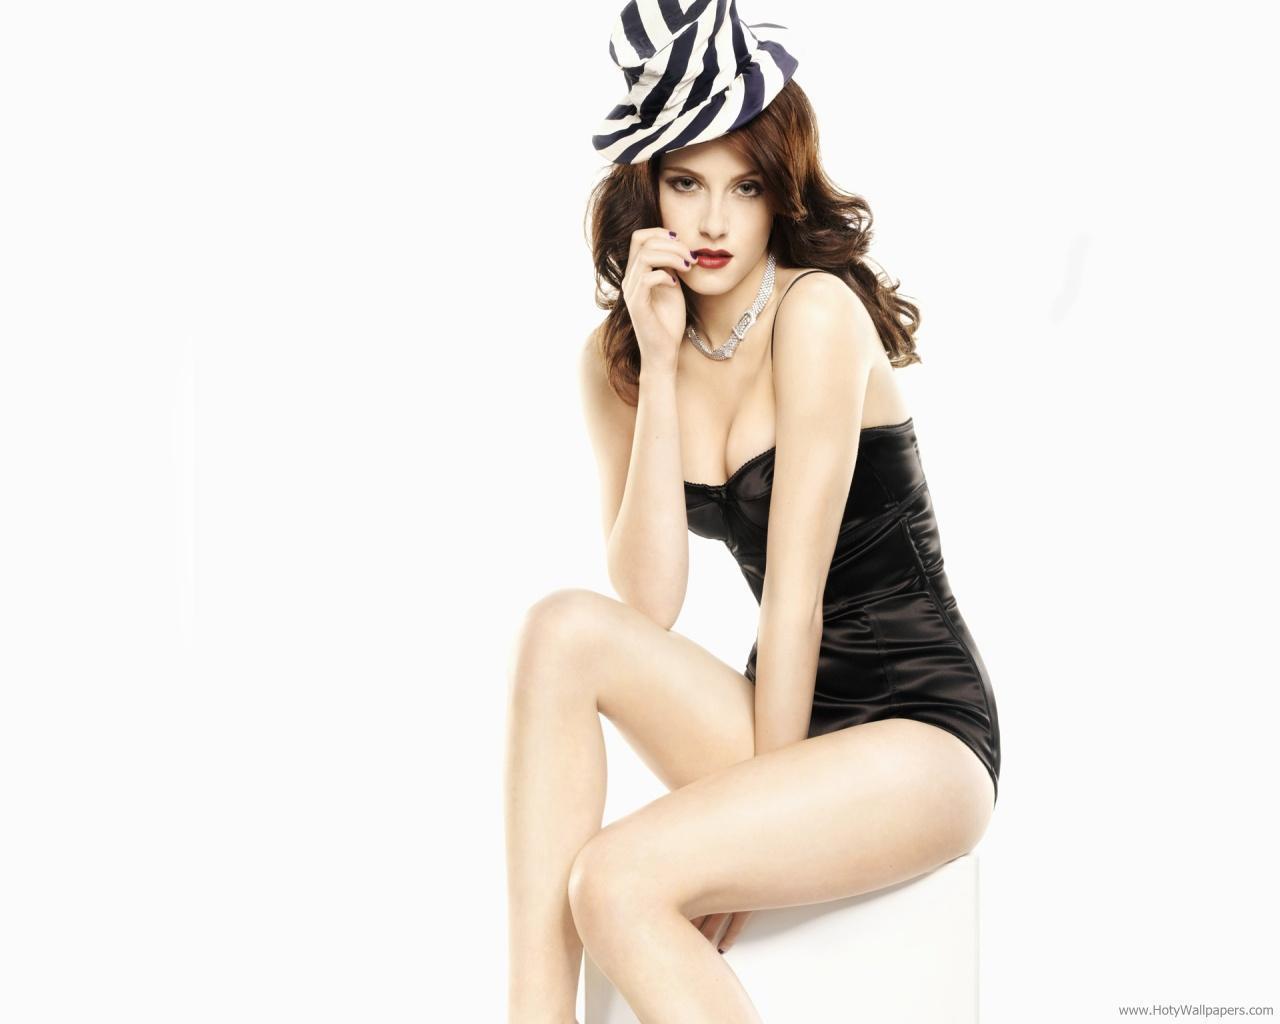 http://1.bp.blogspot.com/-PFzx4mAQW8U/To6_2pQOFYI/AAAAAAAALtY/OguOiz1cAOM/s1600/kristen_stewart_bikini_wallpaper.jpg